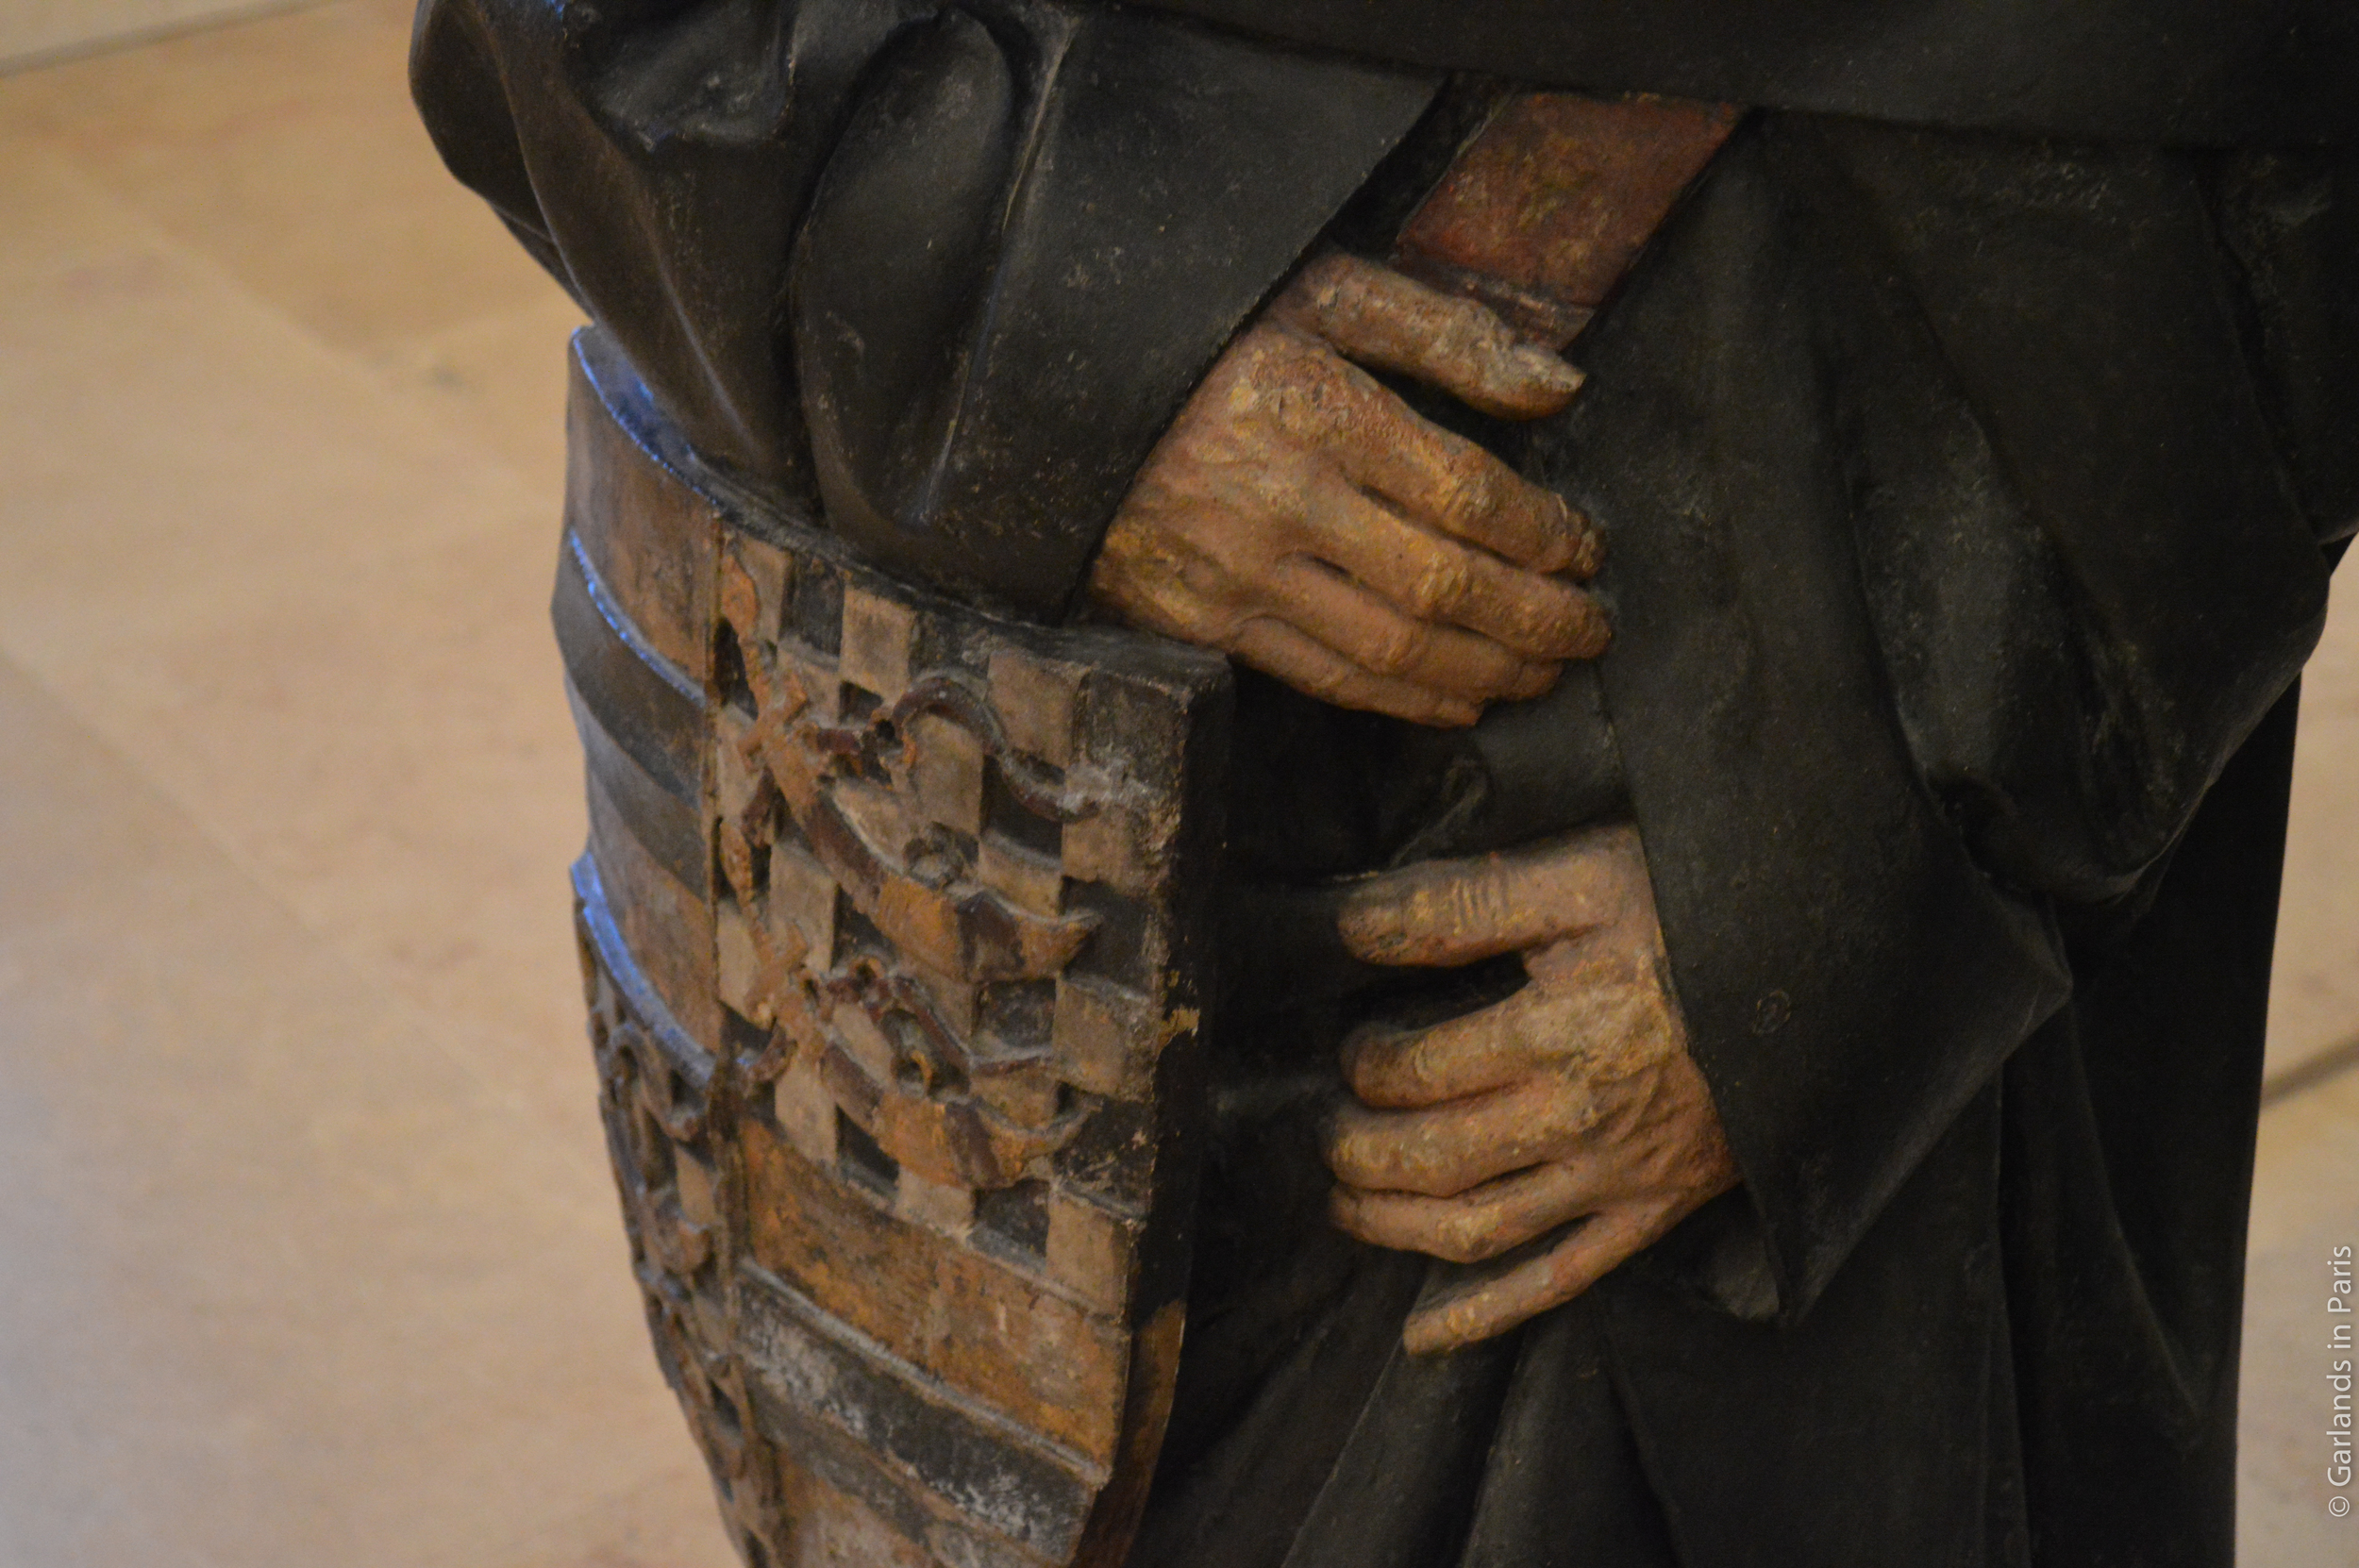 Louvre Museum Statue Hand